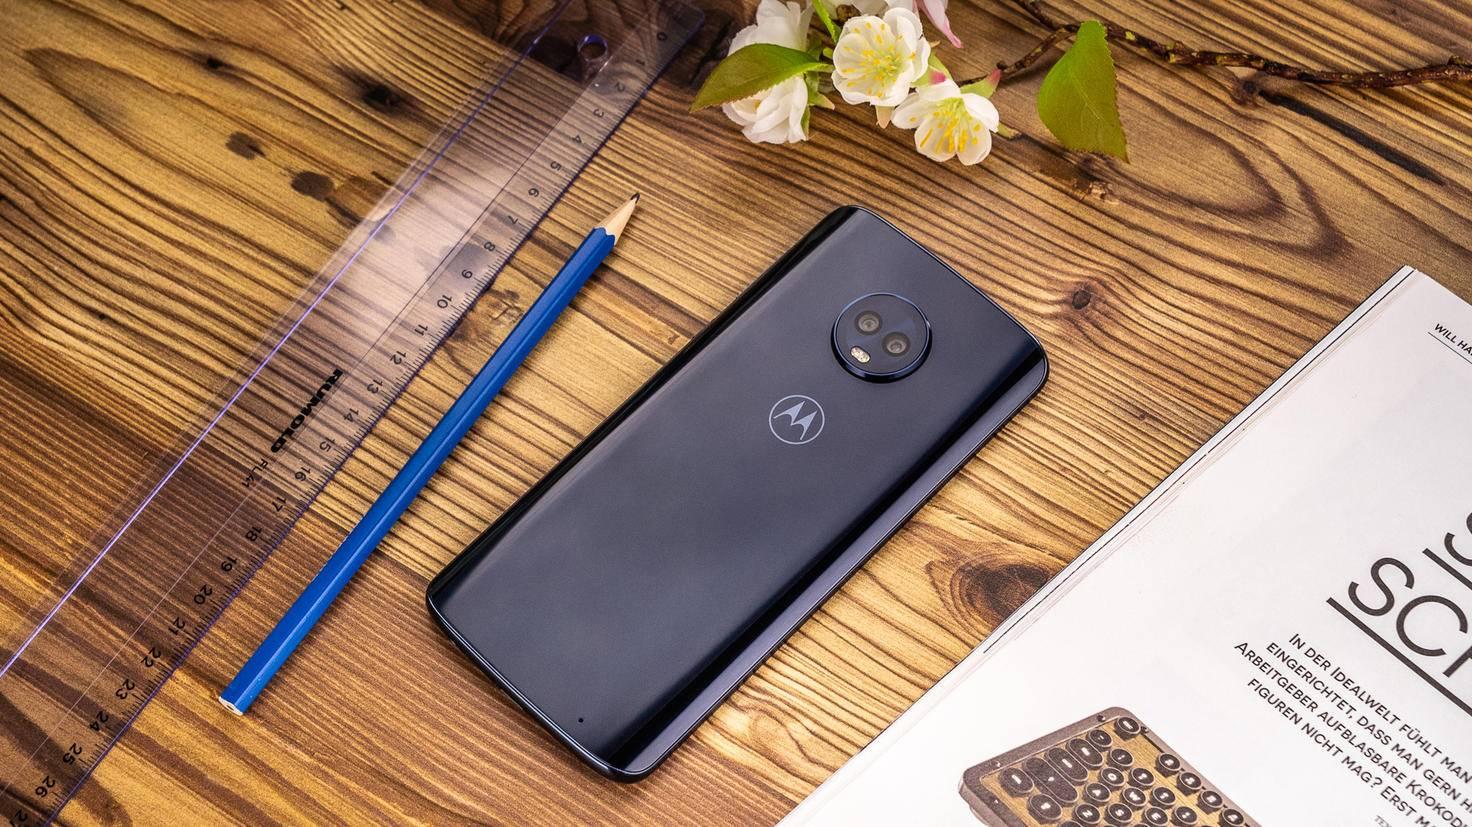 Motorola-Moto-G6-Plus-TURN-ON-2